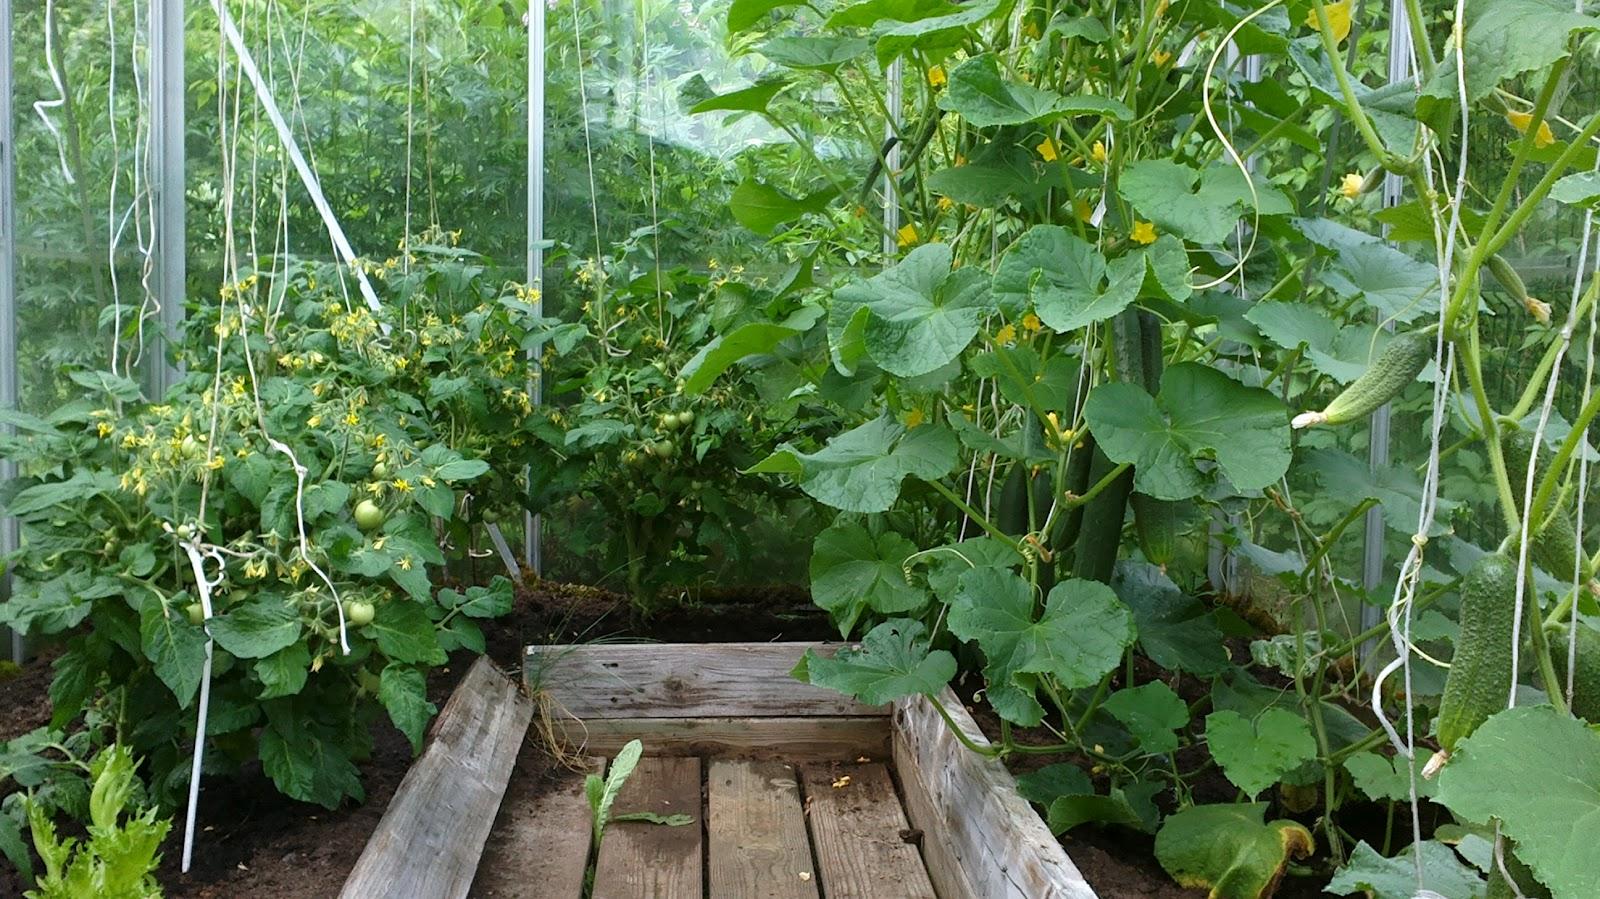 Satoa tulossa? – Getting some harvest?